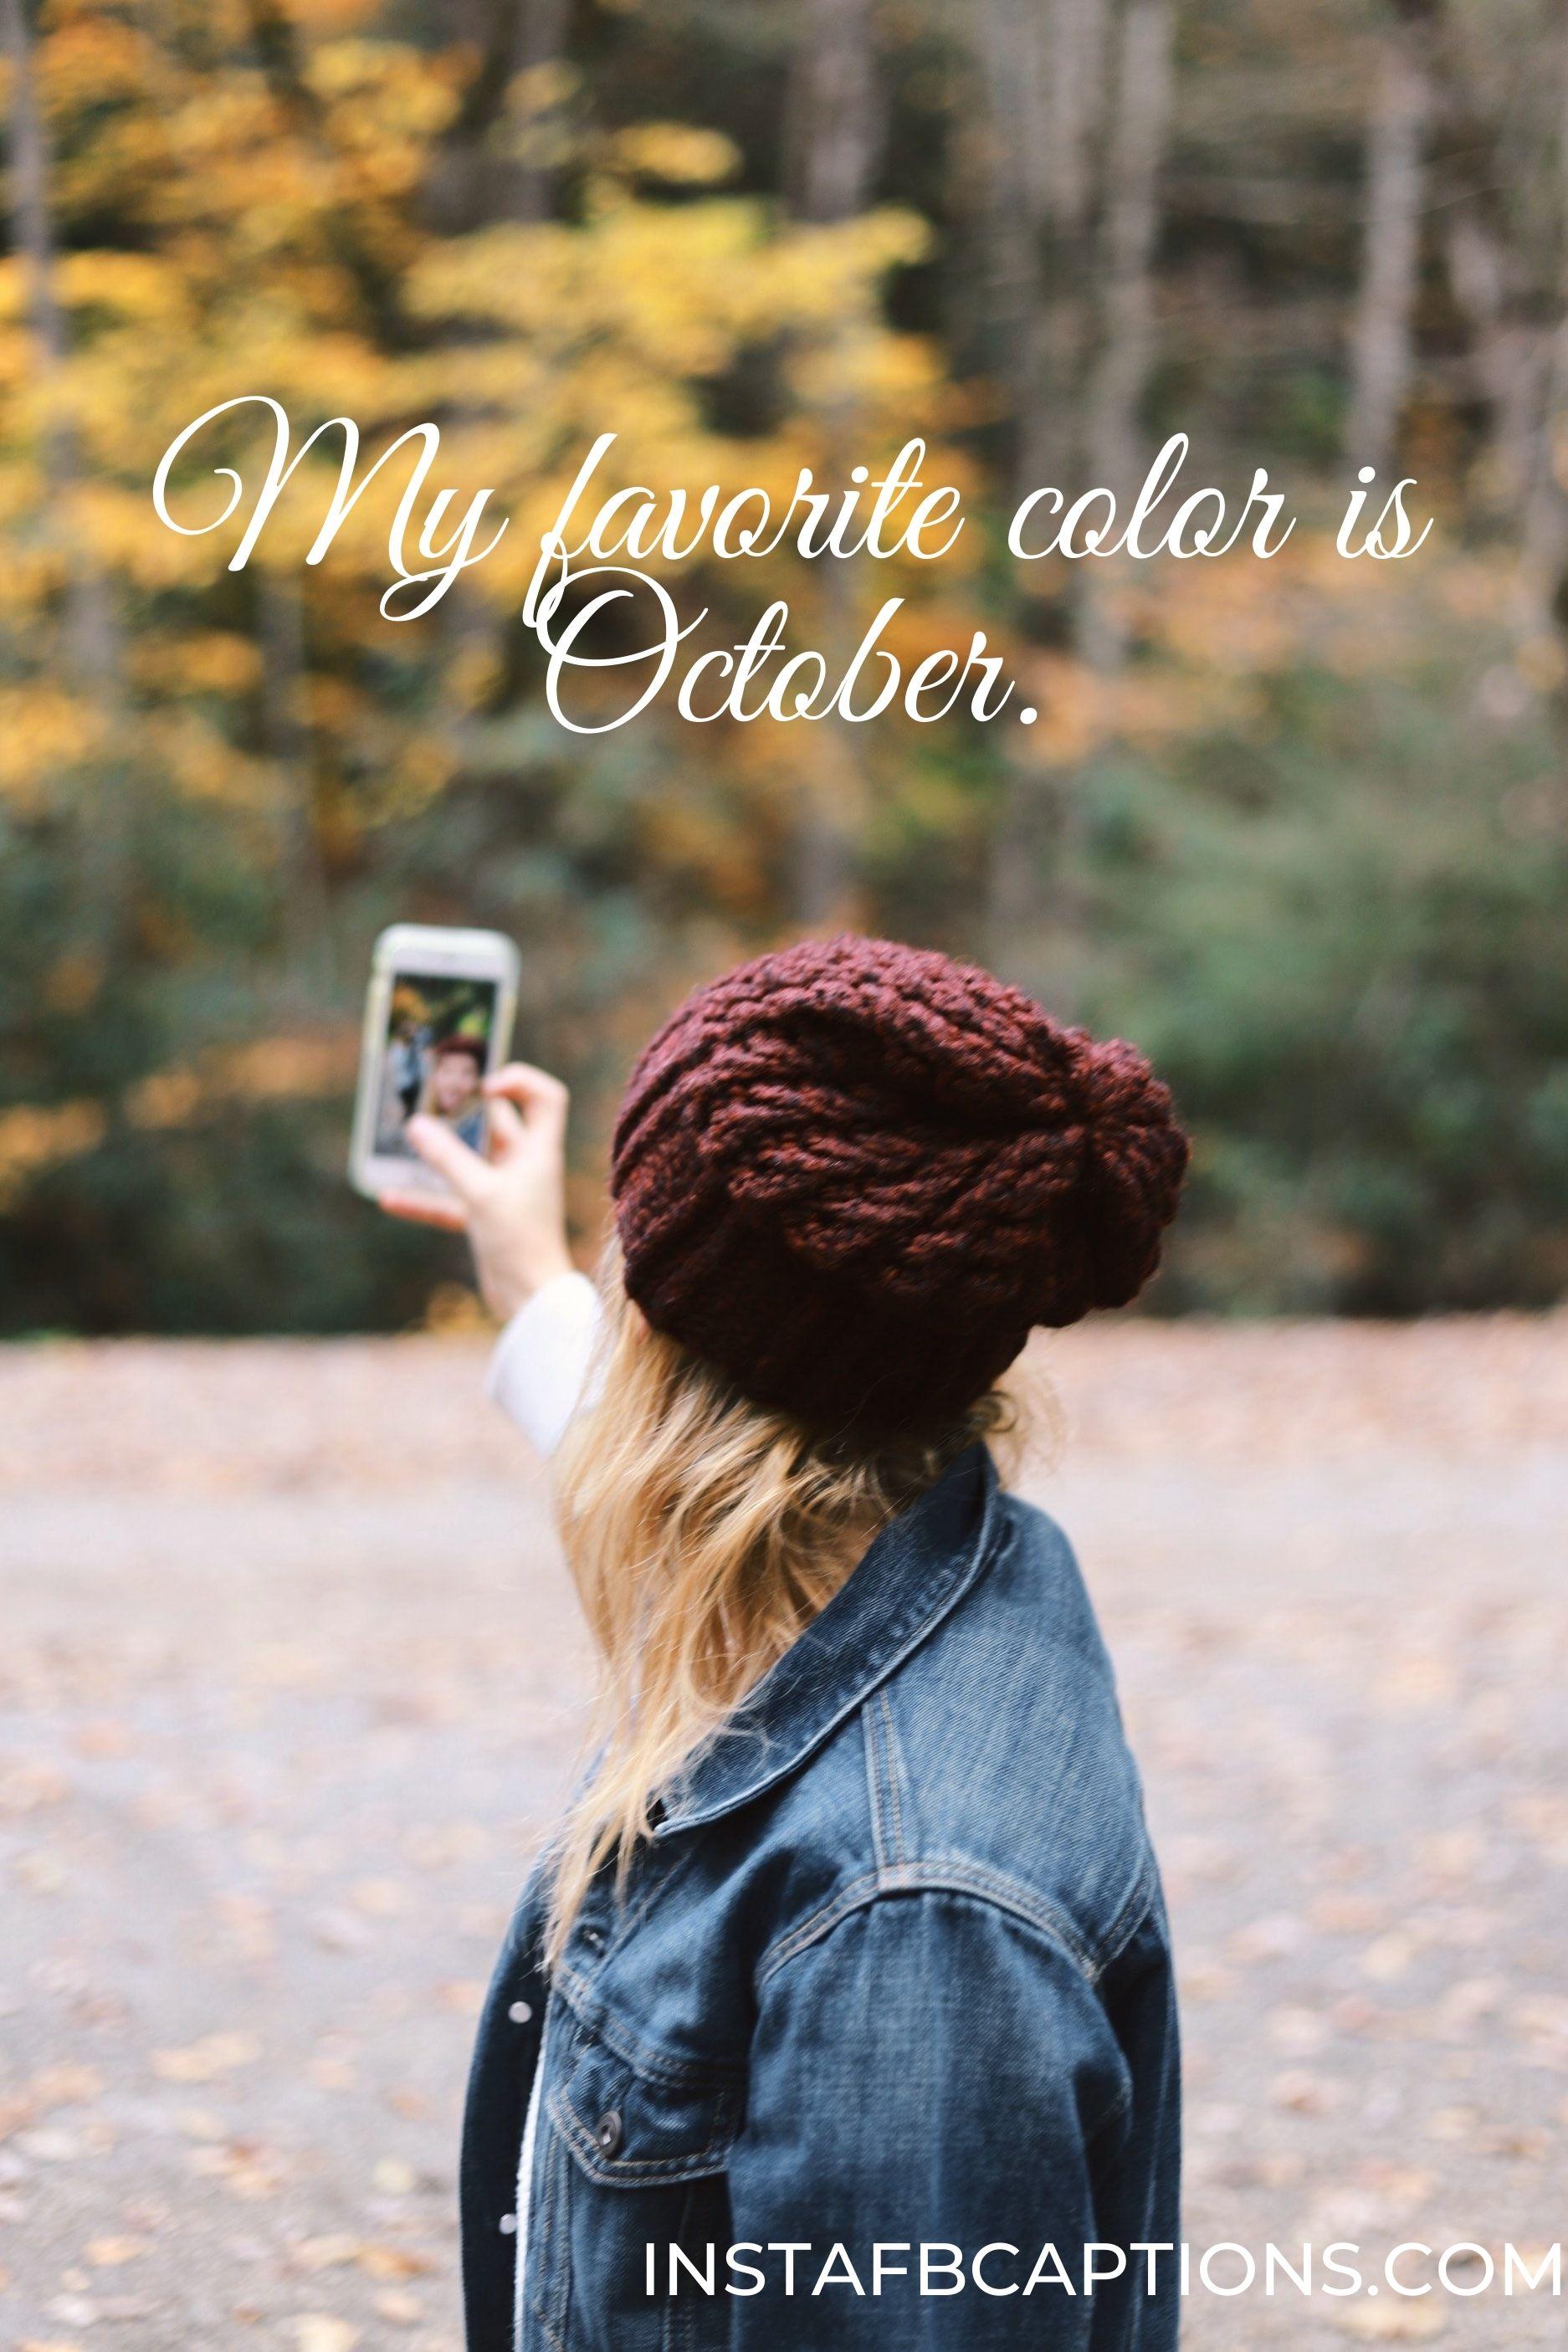 fall selfie captions  - My favorite color is October - Autumn Fall Season Captions || (Leaf Pumpkin Selfie)